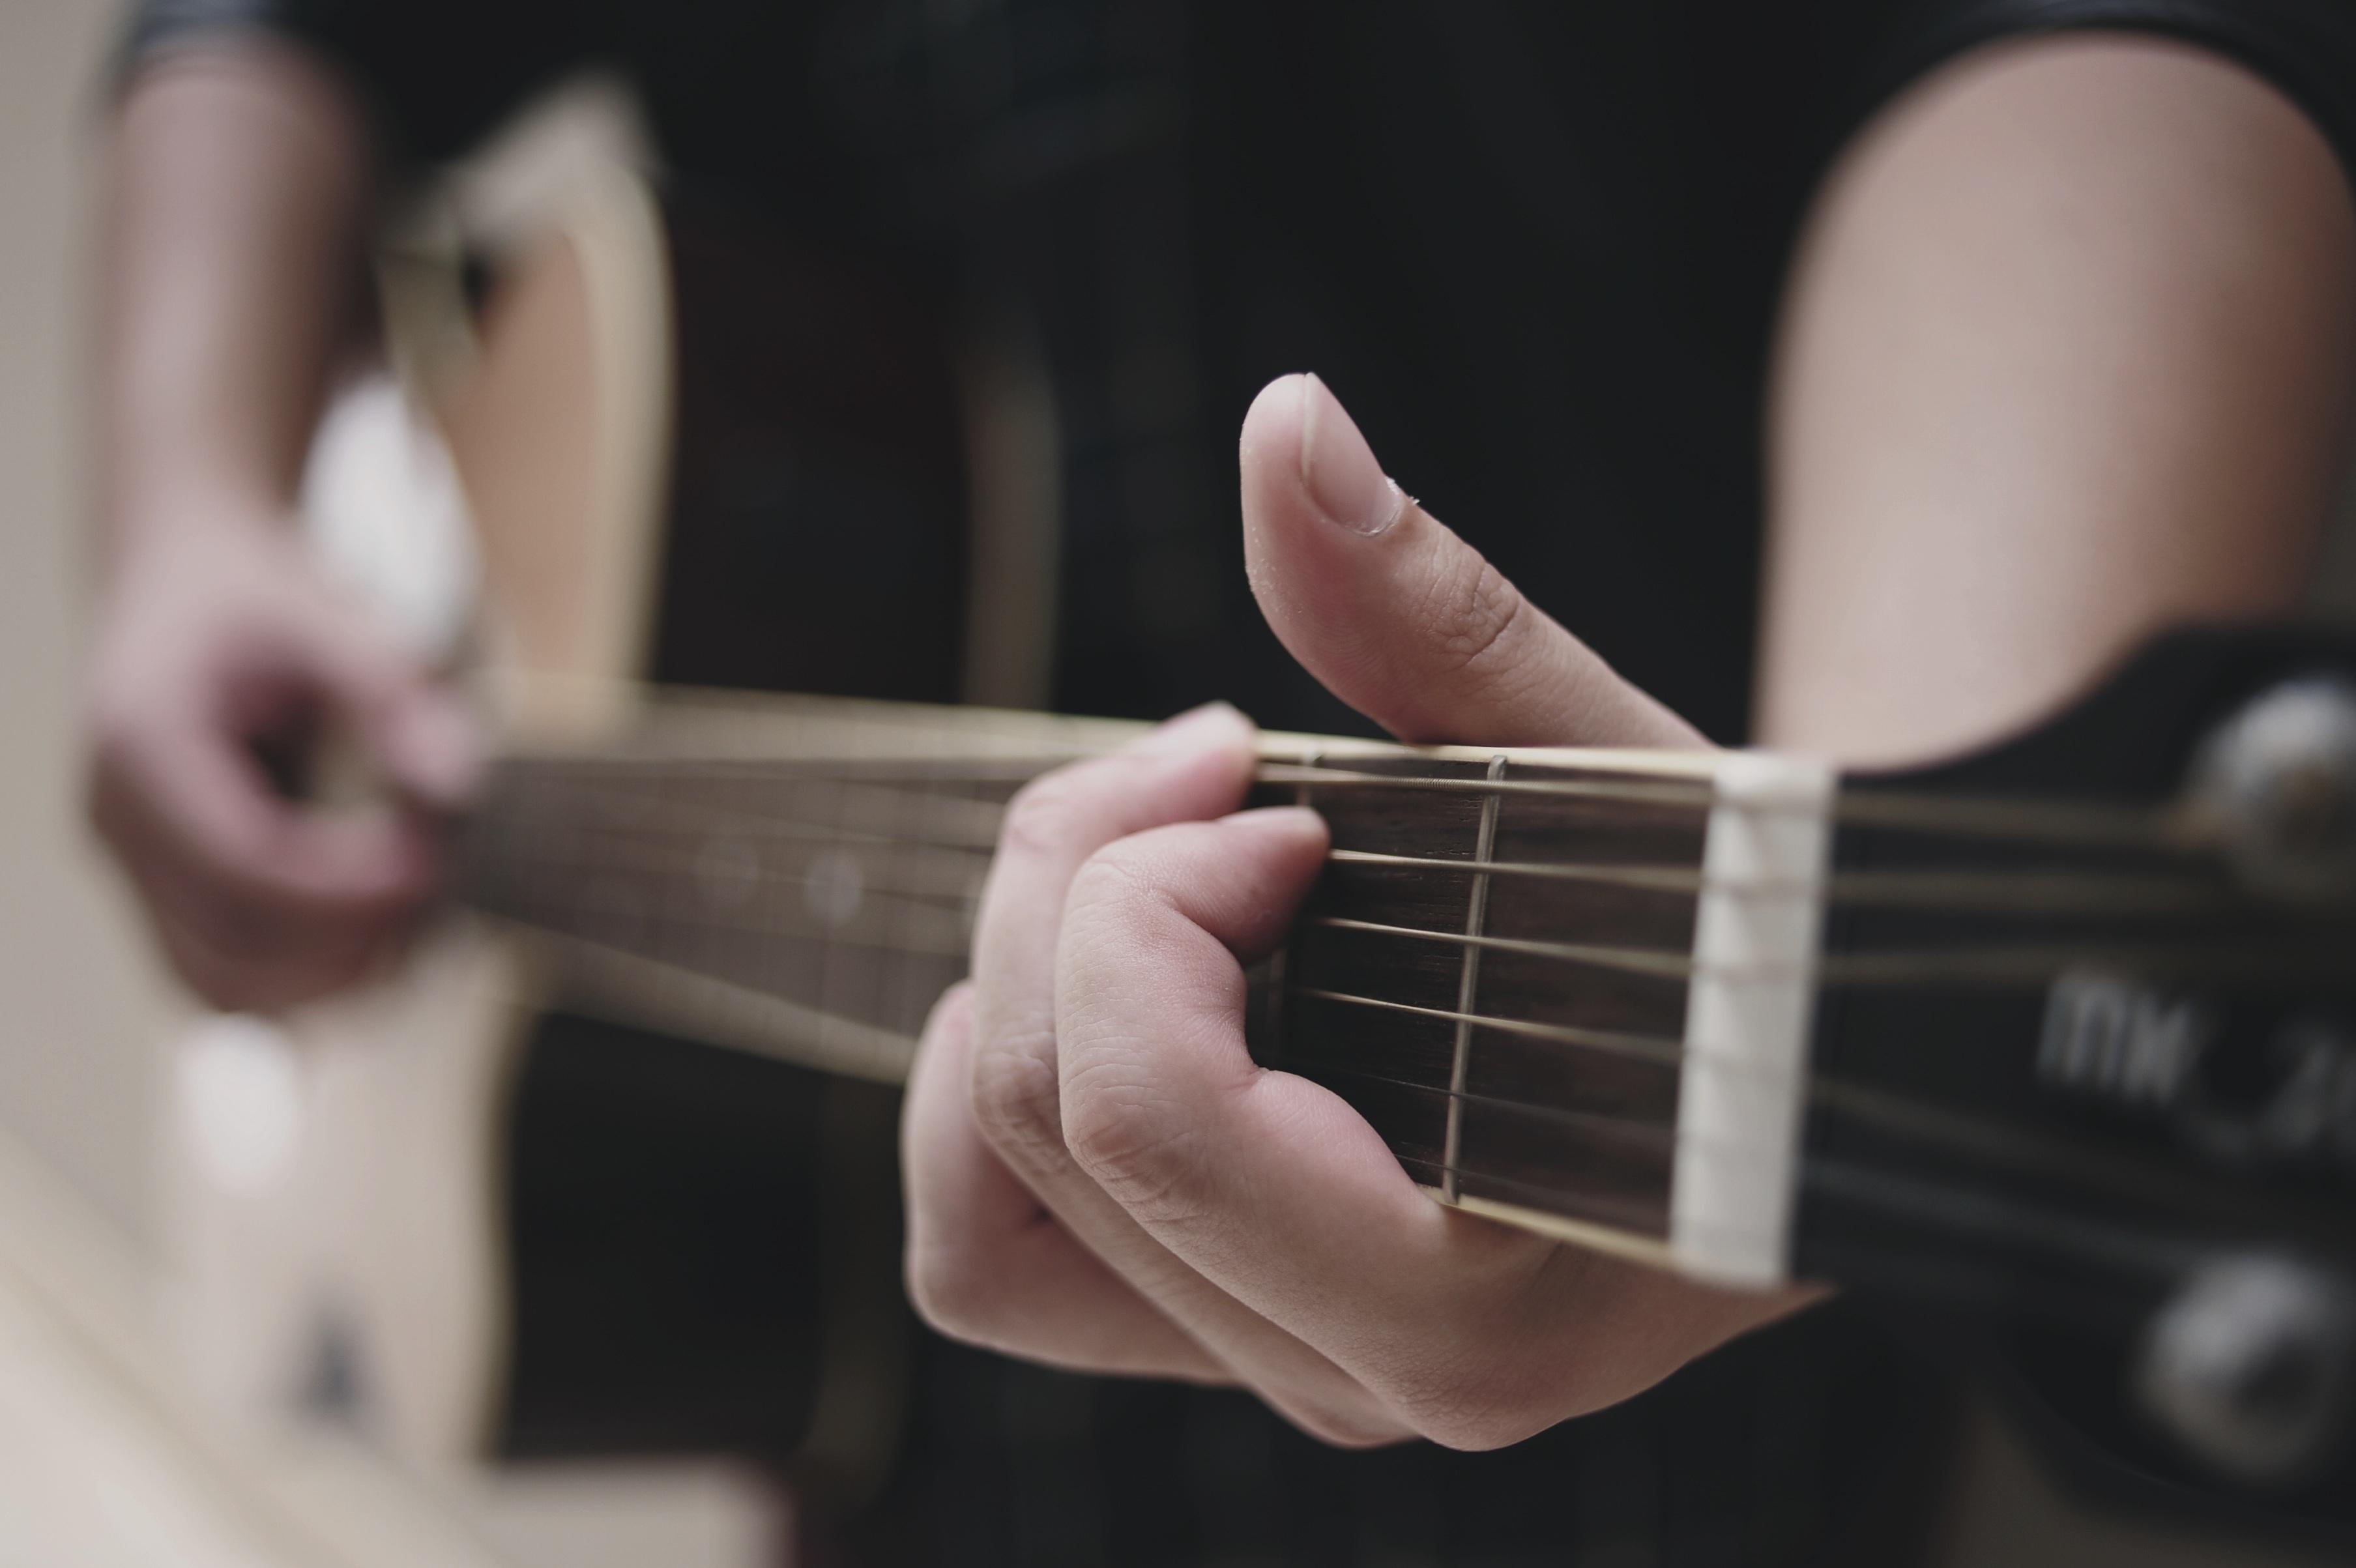 Fileg Add9 Chord In Guitar 2014 05 31 20 43g Wikimedia Commons